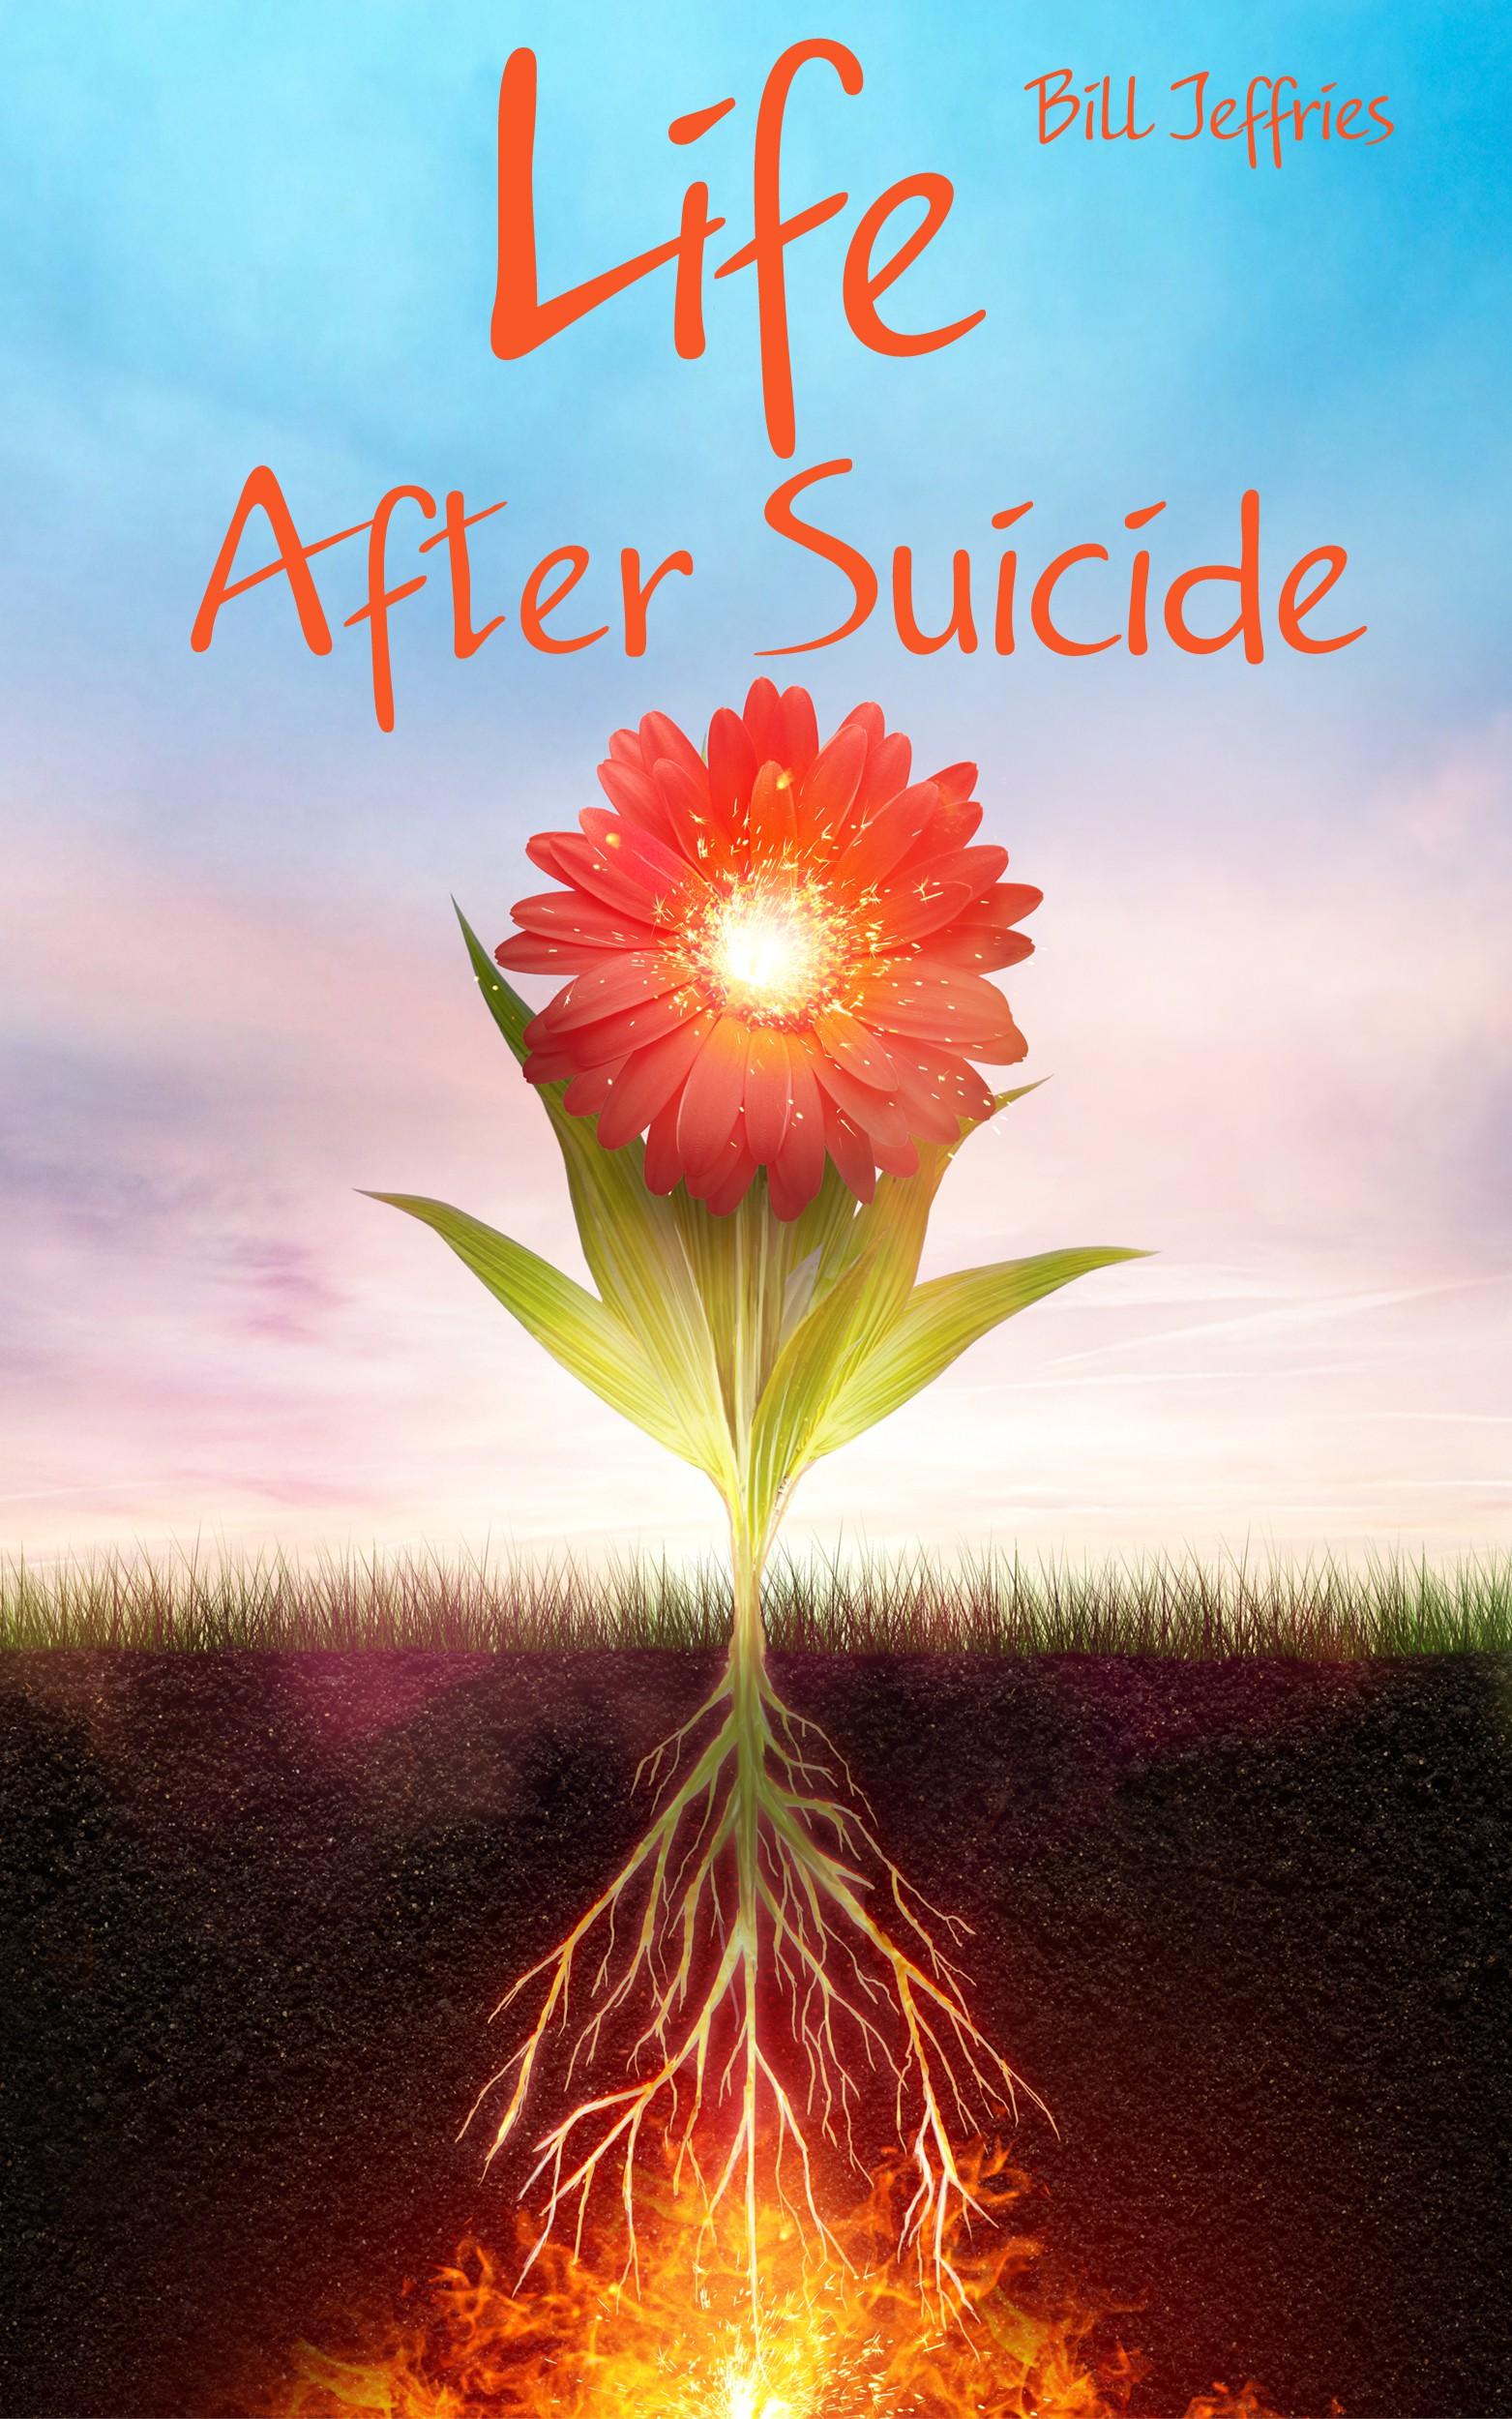 Inspirational book cover for inspirational book